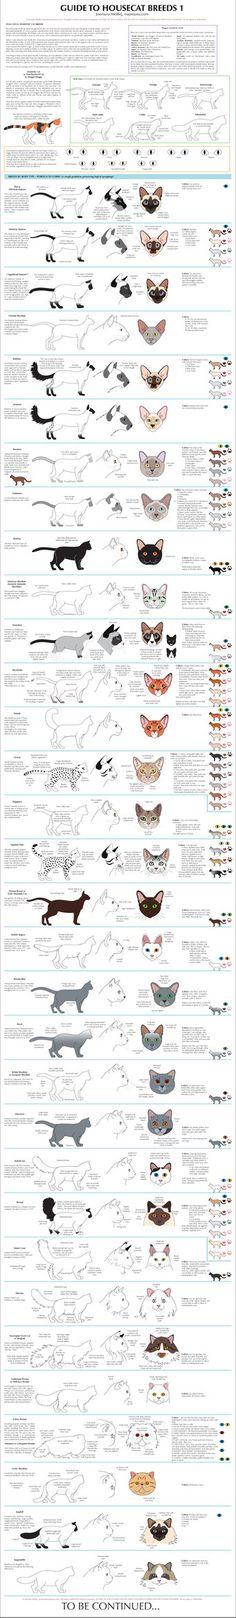 Guide to Housecat Breeds 1 by Majnouna on DeviantArt